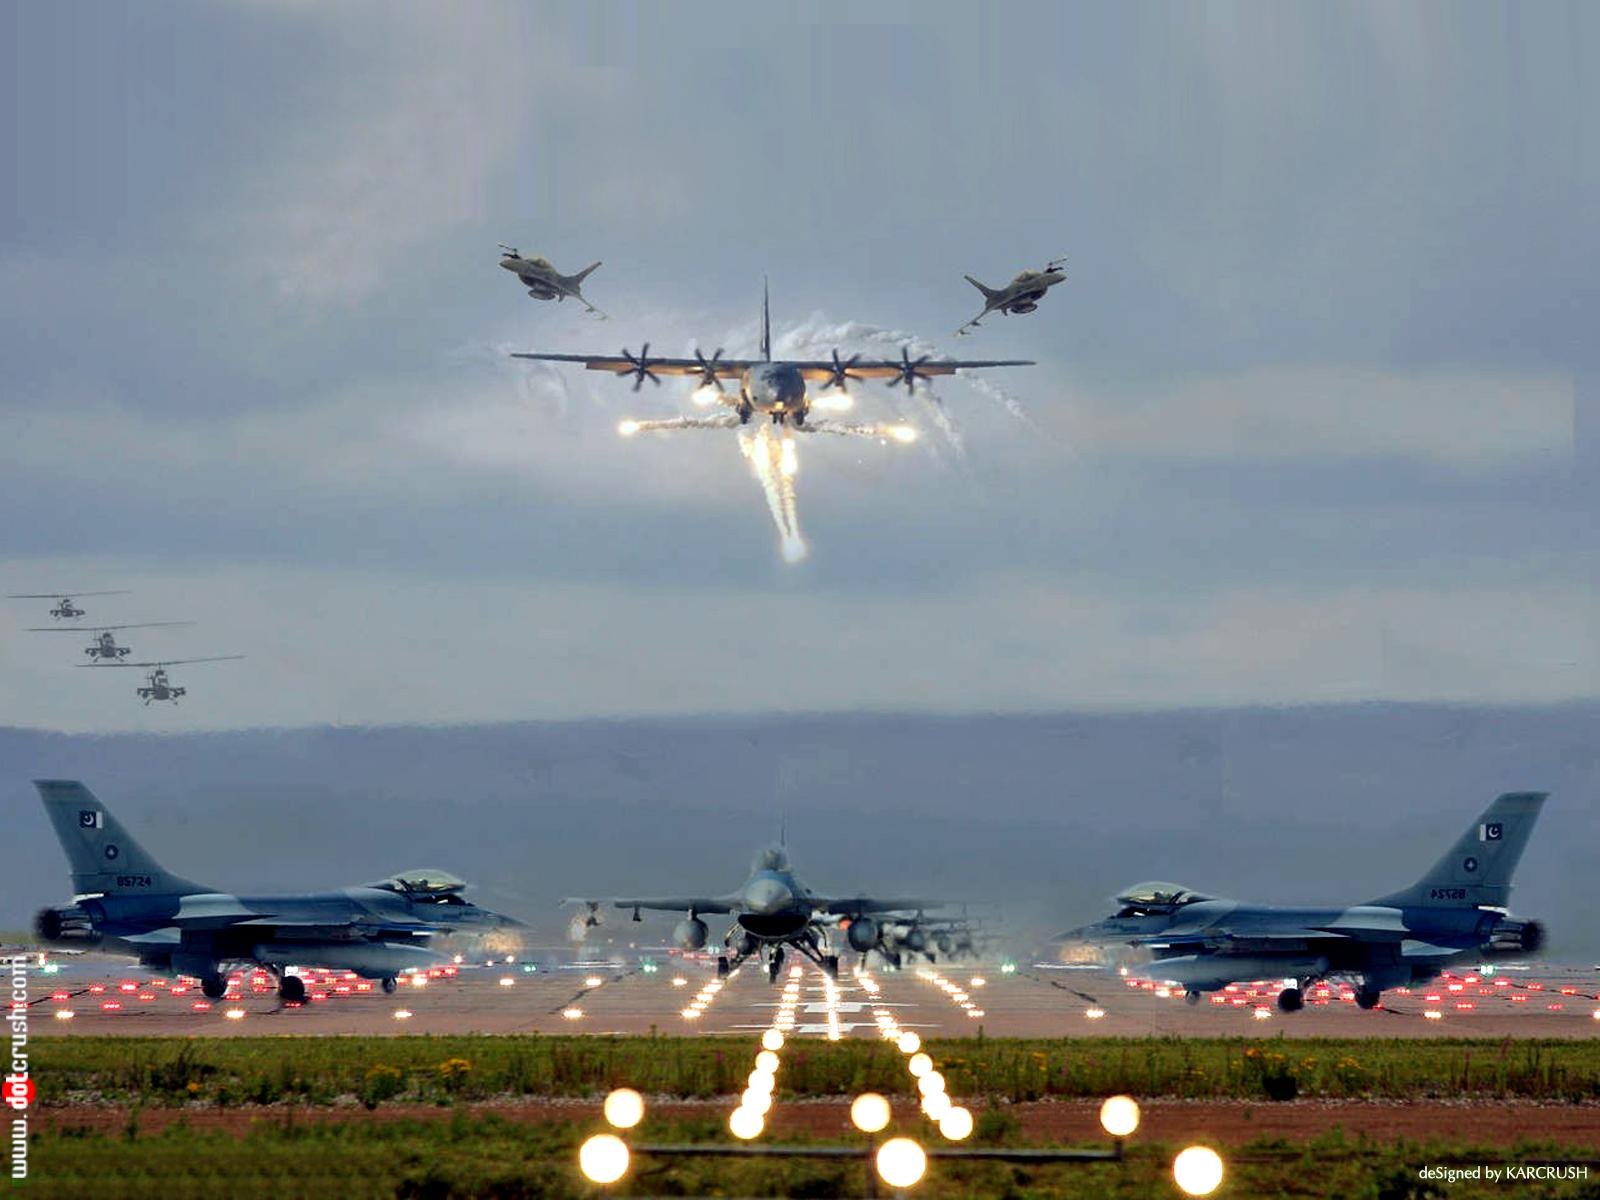 http://4.bp.blogspot.com/-X_Ru0ey05LU/Tzkf3MP3-gI/AAAAAAAADEA/pfoJR8X9Wys/s1600/pakistan-air-force-2.jpg